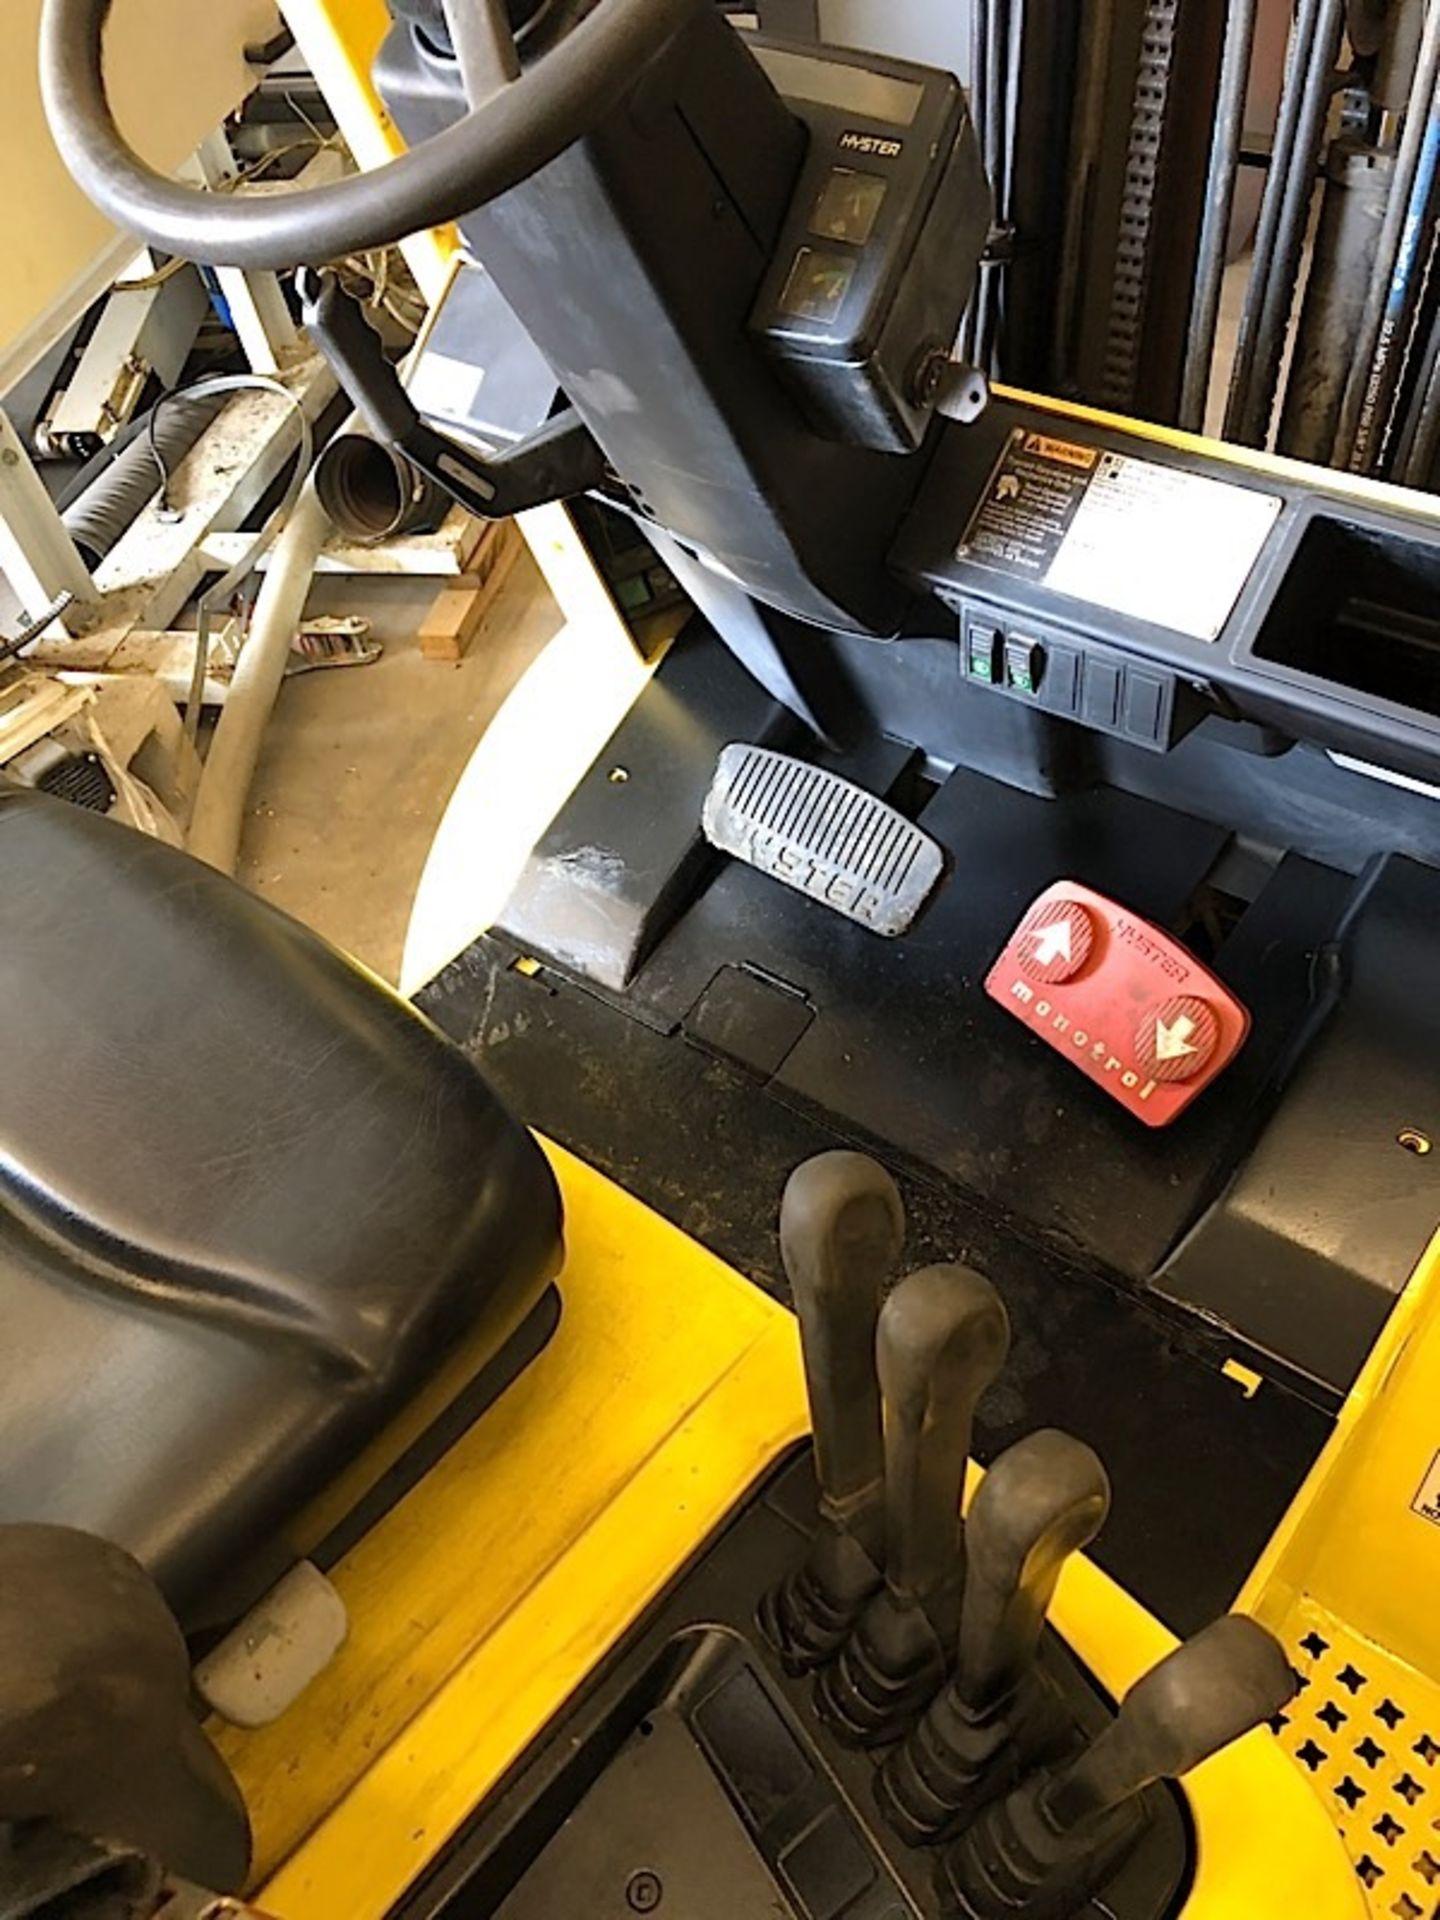 Lot 54 - Hyster (S50XM) 5,000 lbs. cap Outdoor / Pneumatic Tire LPG Forklift